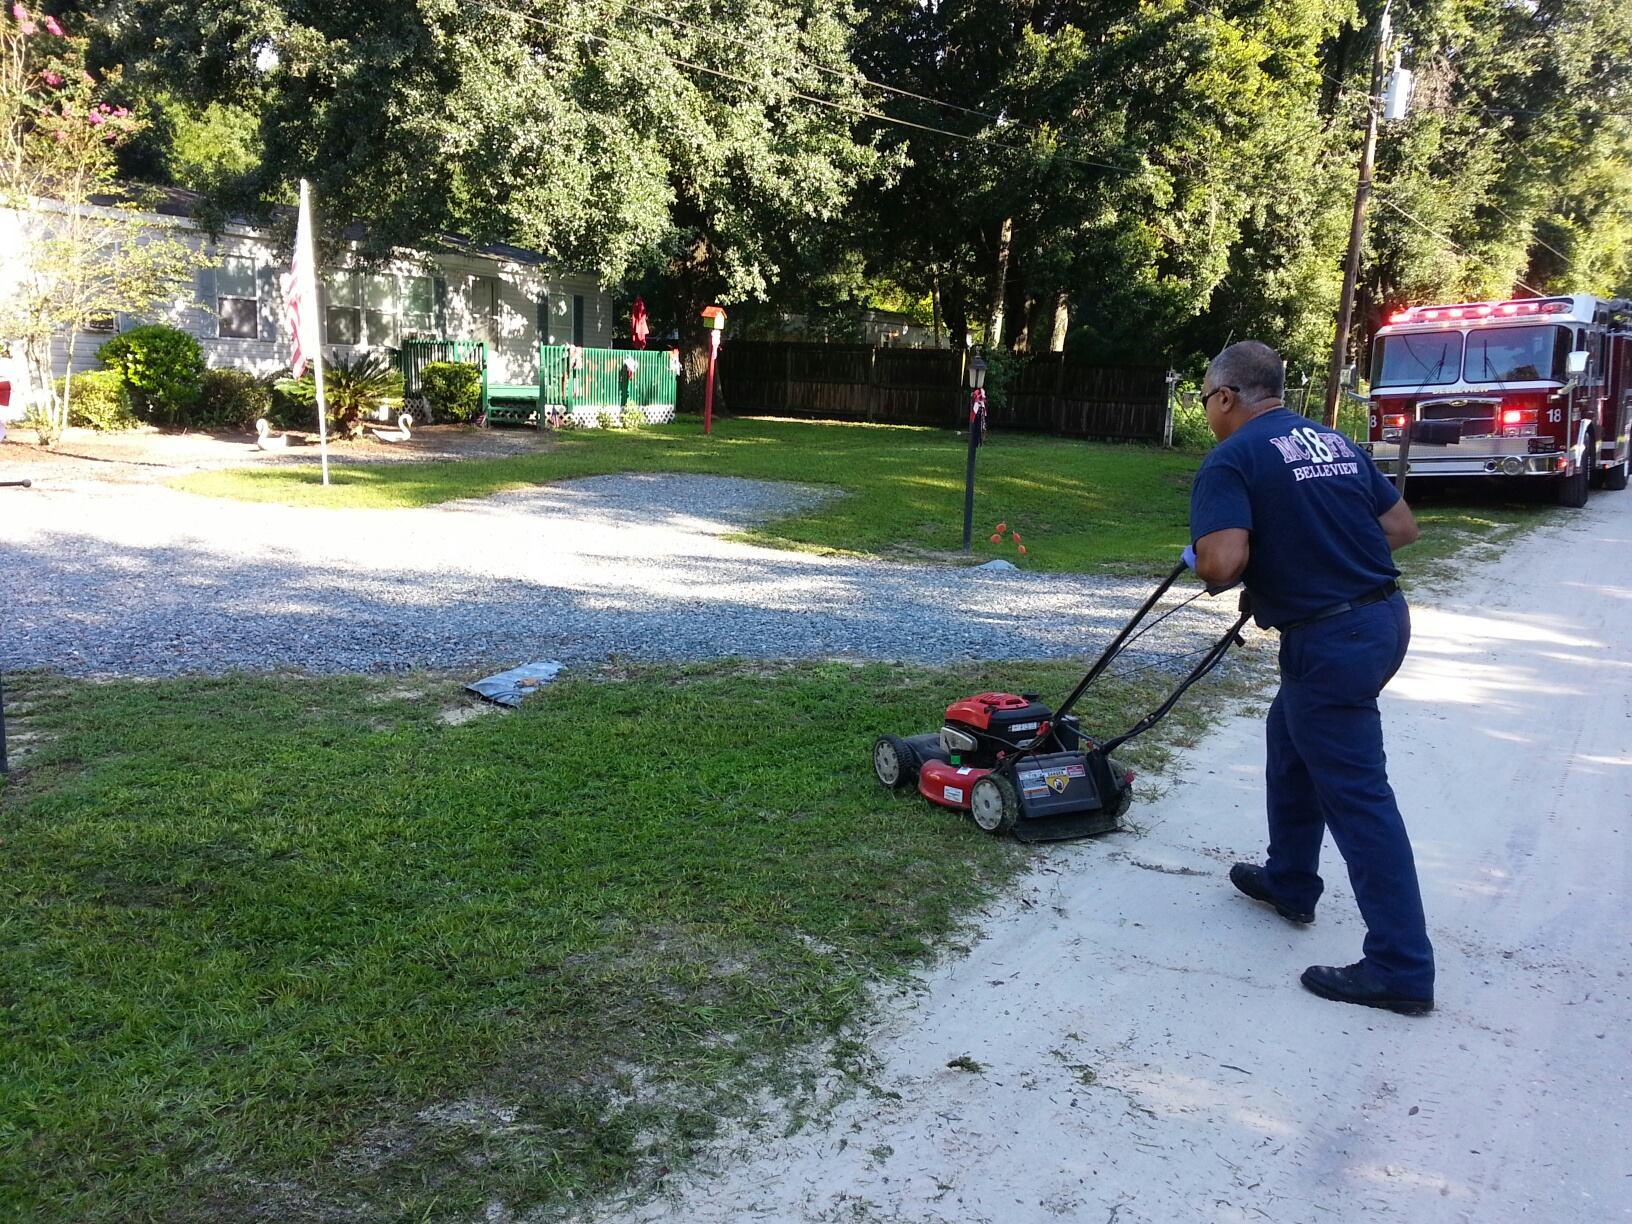 MCFR, E18, positive news, heroes, firefighters, ems, ocala post, marion county news, florida